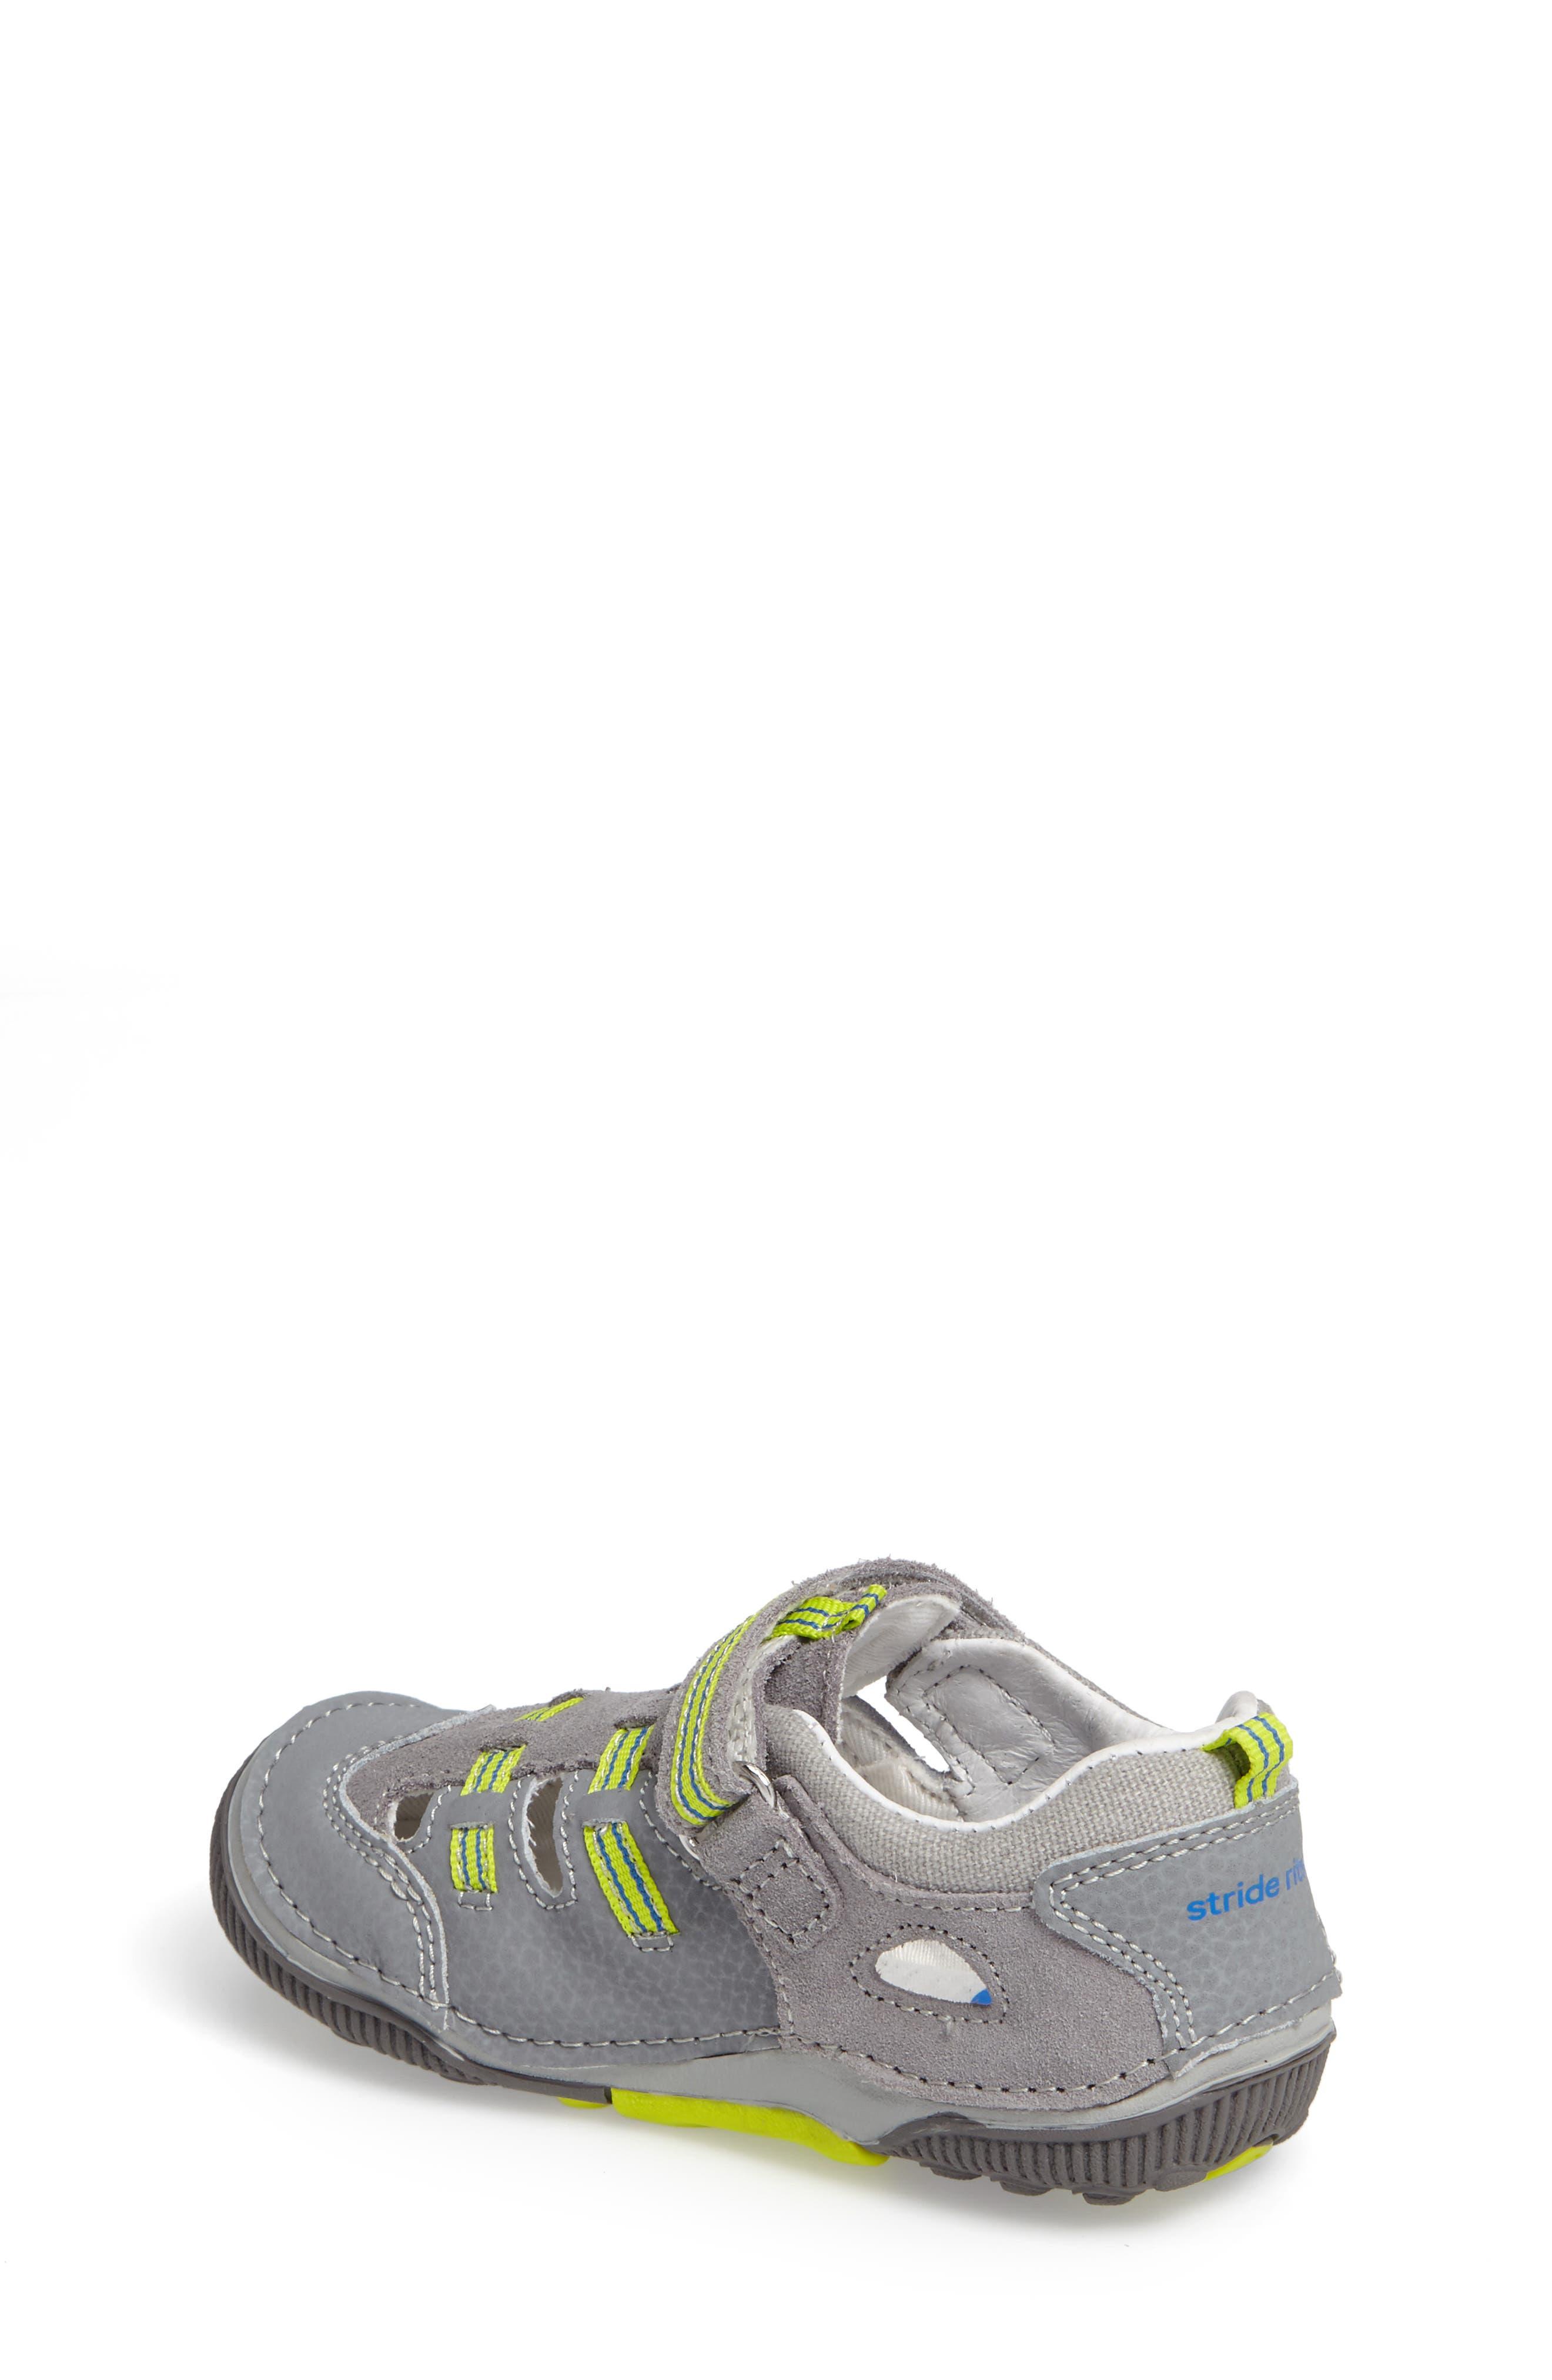 Reggie Cutout Sneaker,                             Alternate thumbnail 2, color,                             020